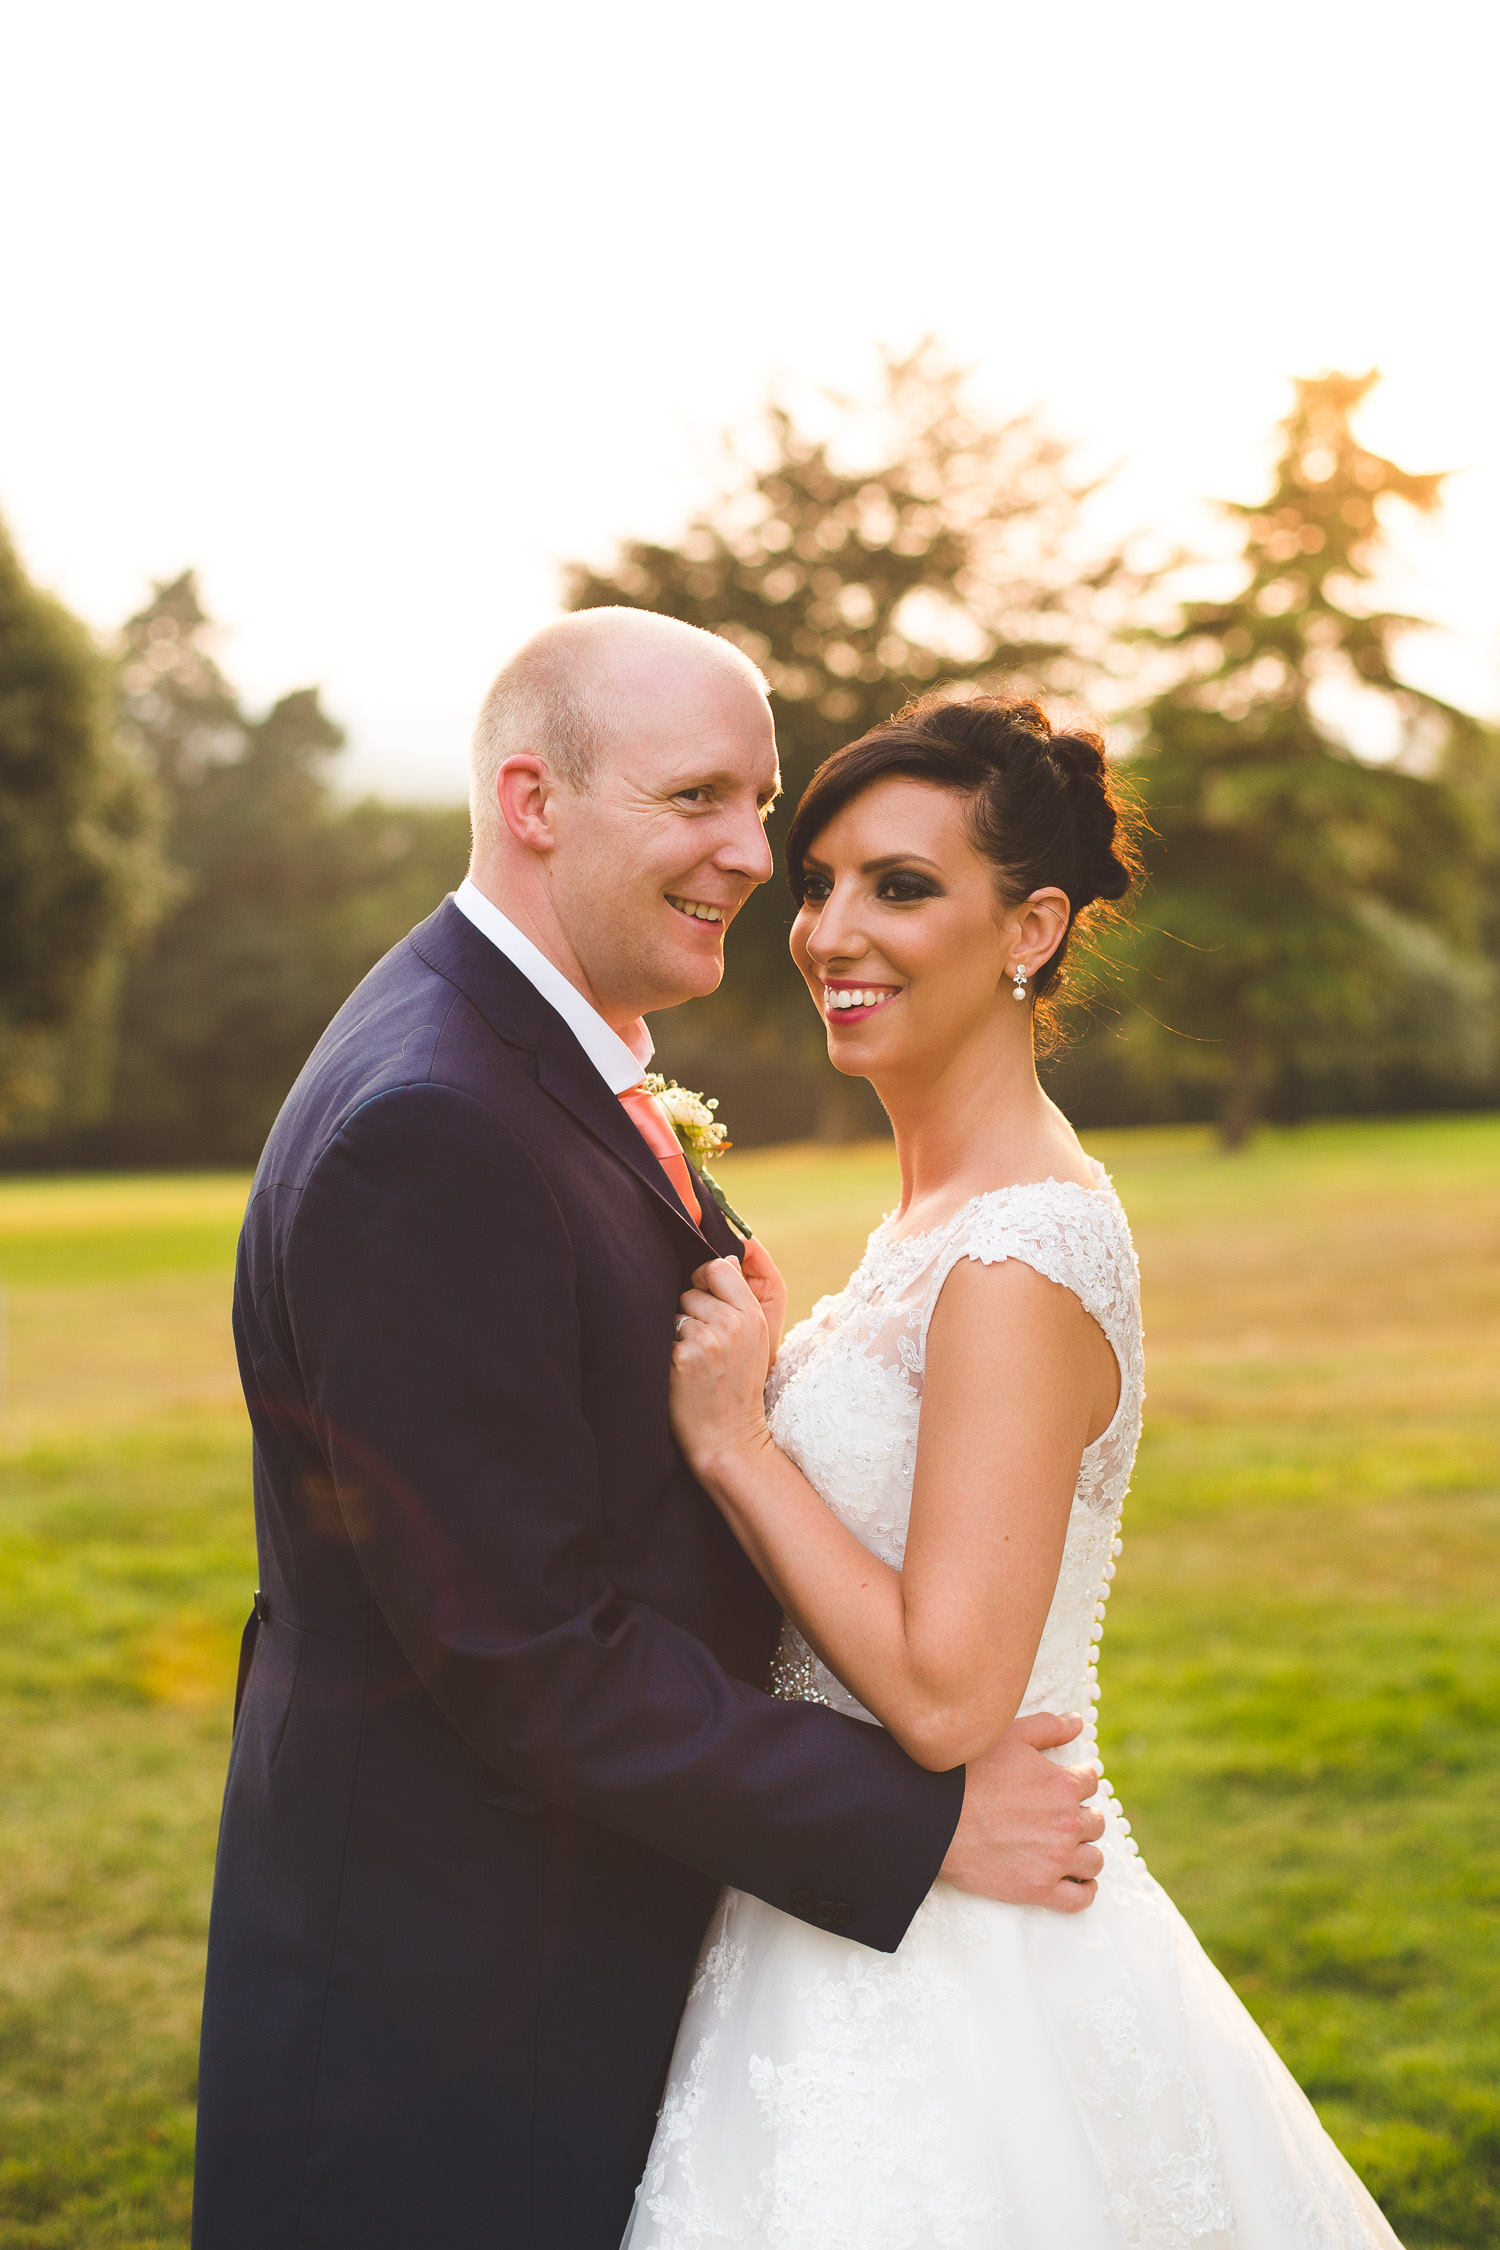 Surrey Wedding Photographer Hannah Dan140.jpg